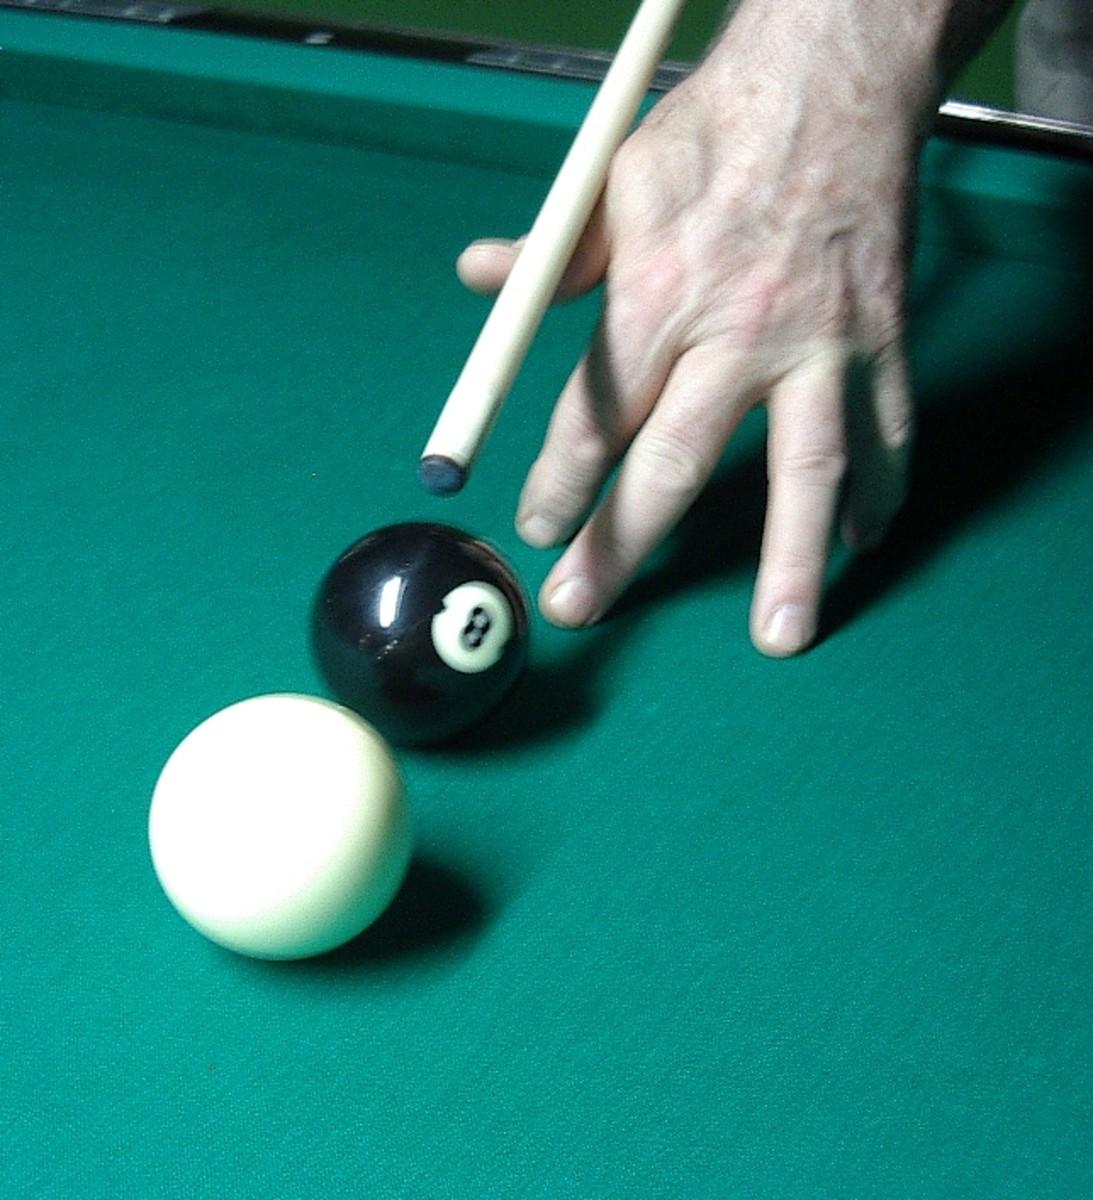 Over-the-ball bridge